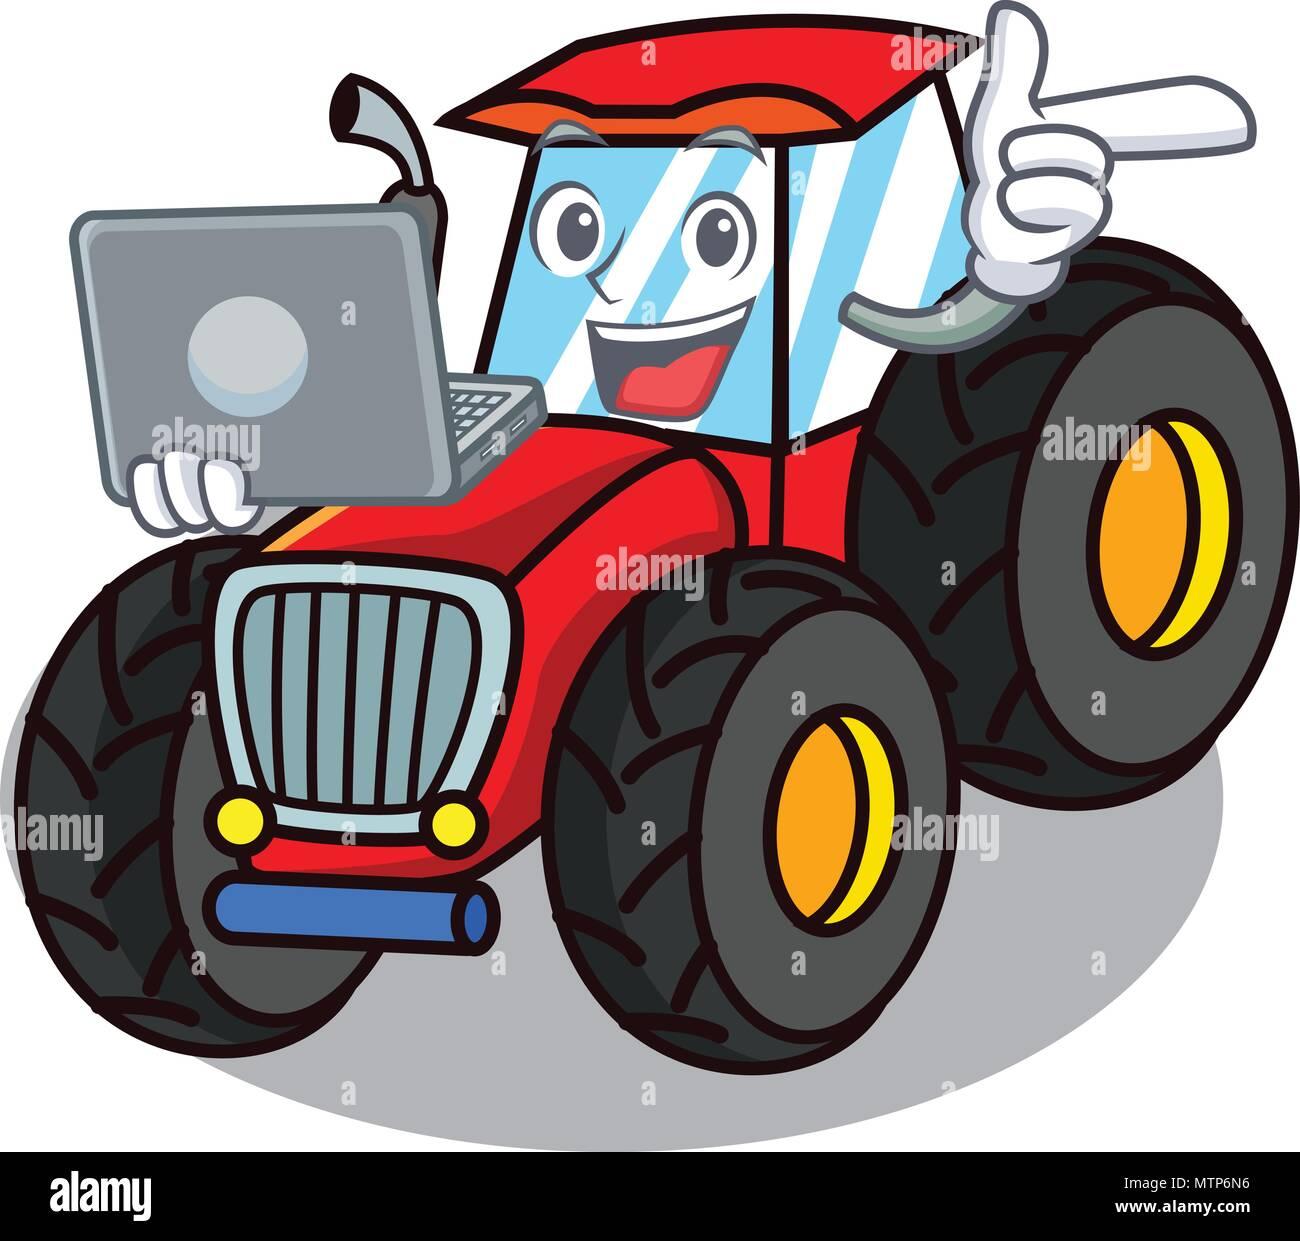 Mit Laptop Traktor Charakter Cartoon Stil Vektor Abbildung Bild